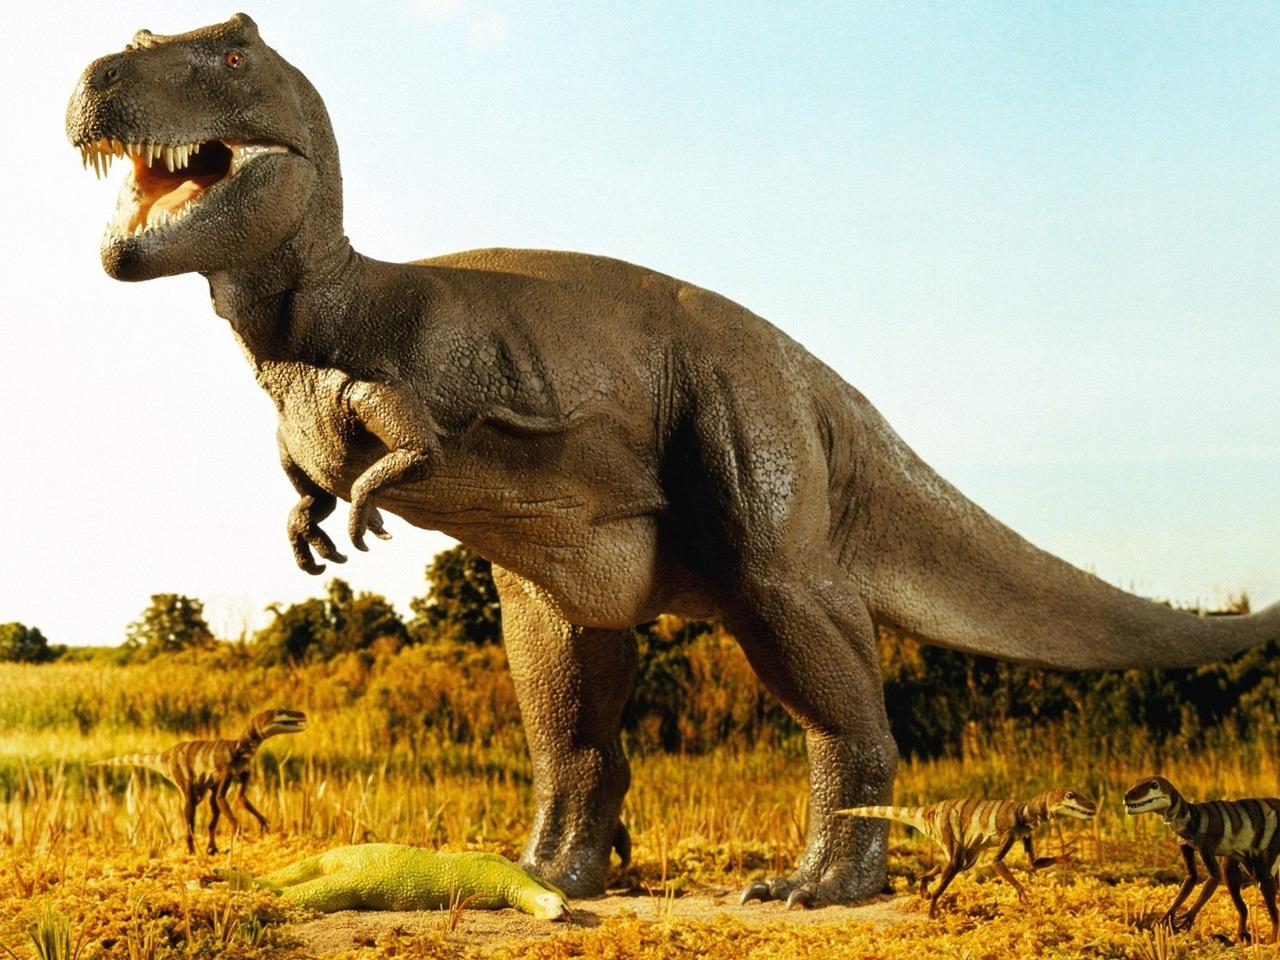 Imagine Images hd Dinosaur Awesome Imagine hd